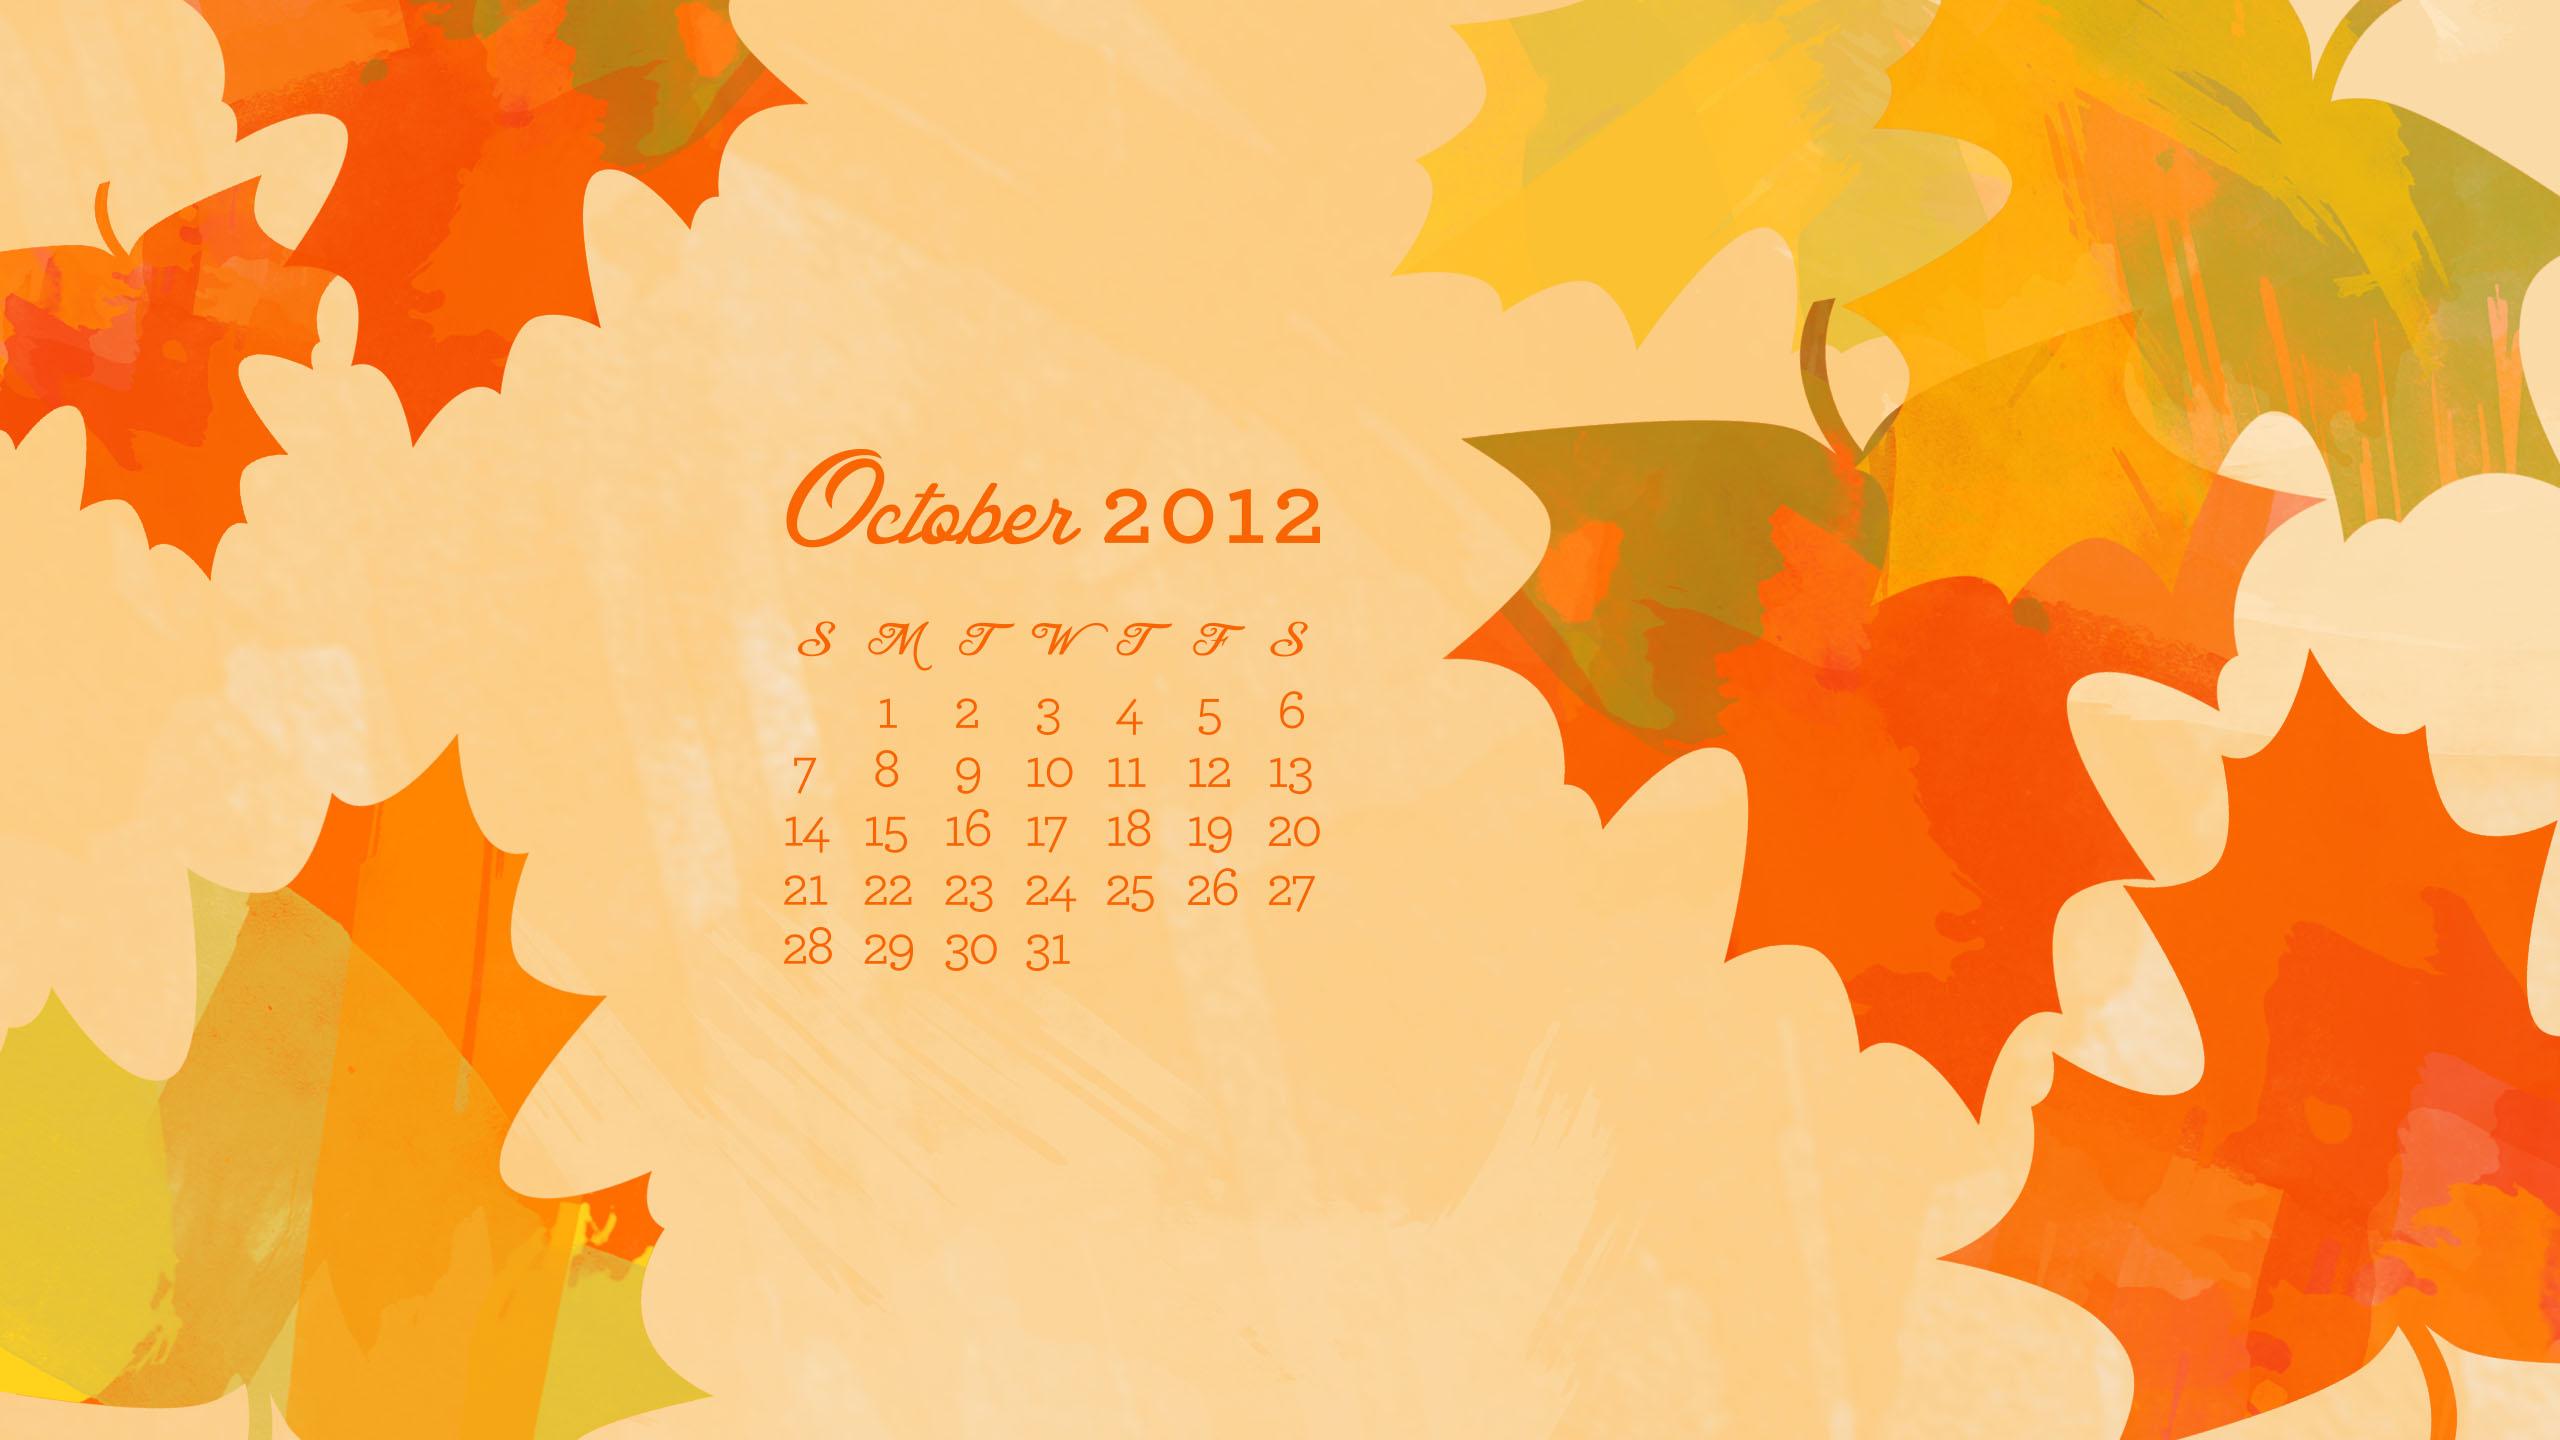 Calendar Wallpaper October : October desktop iphone ipad calendar wallpaper